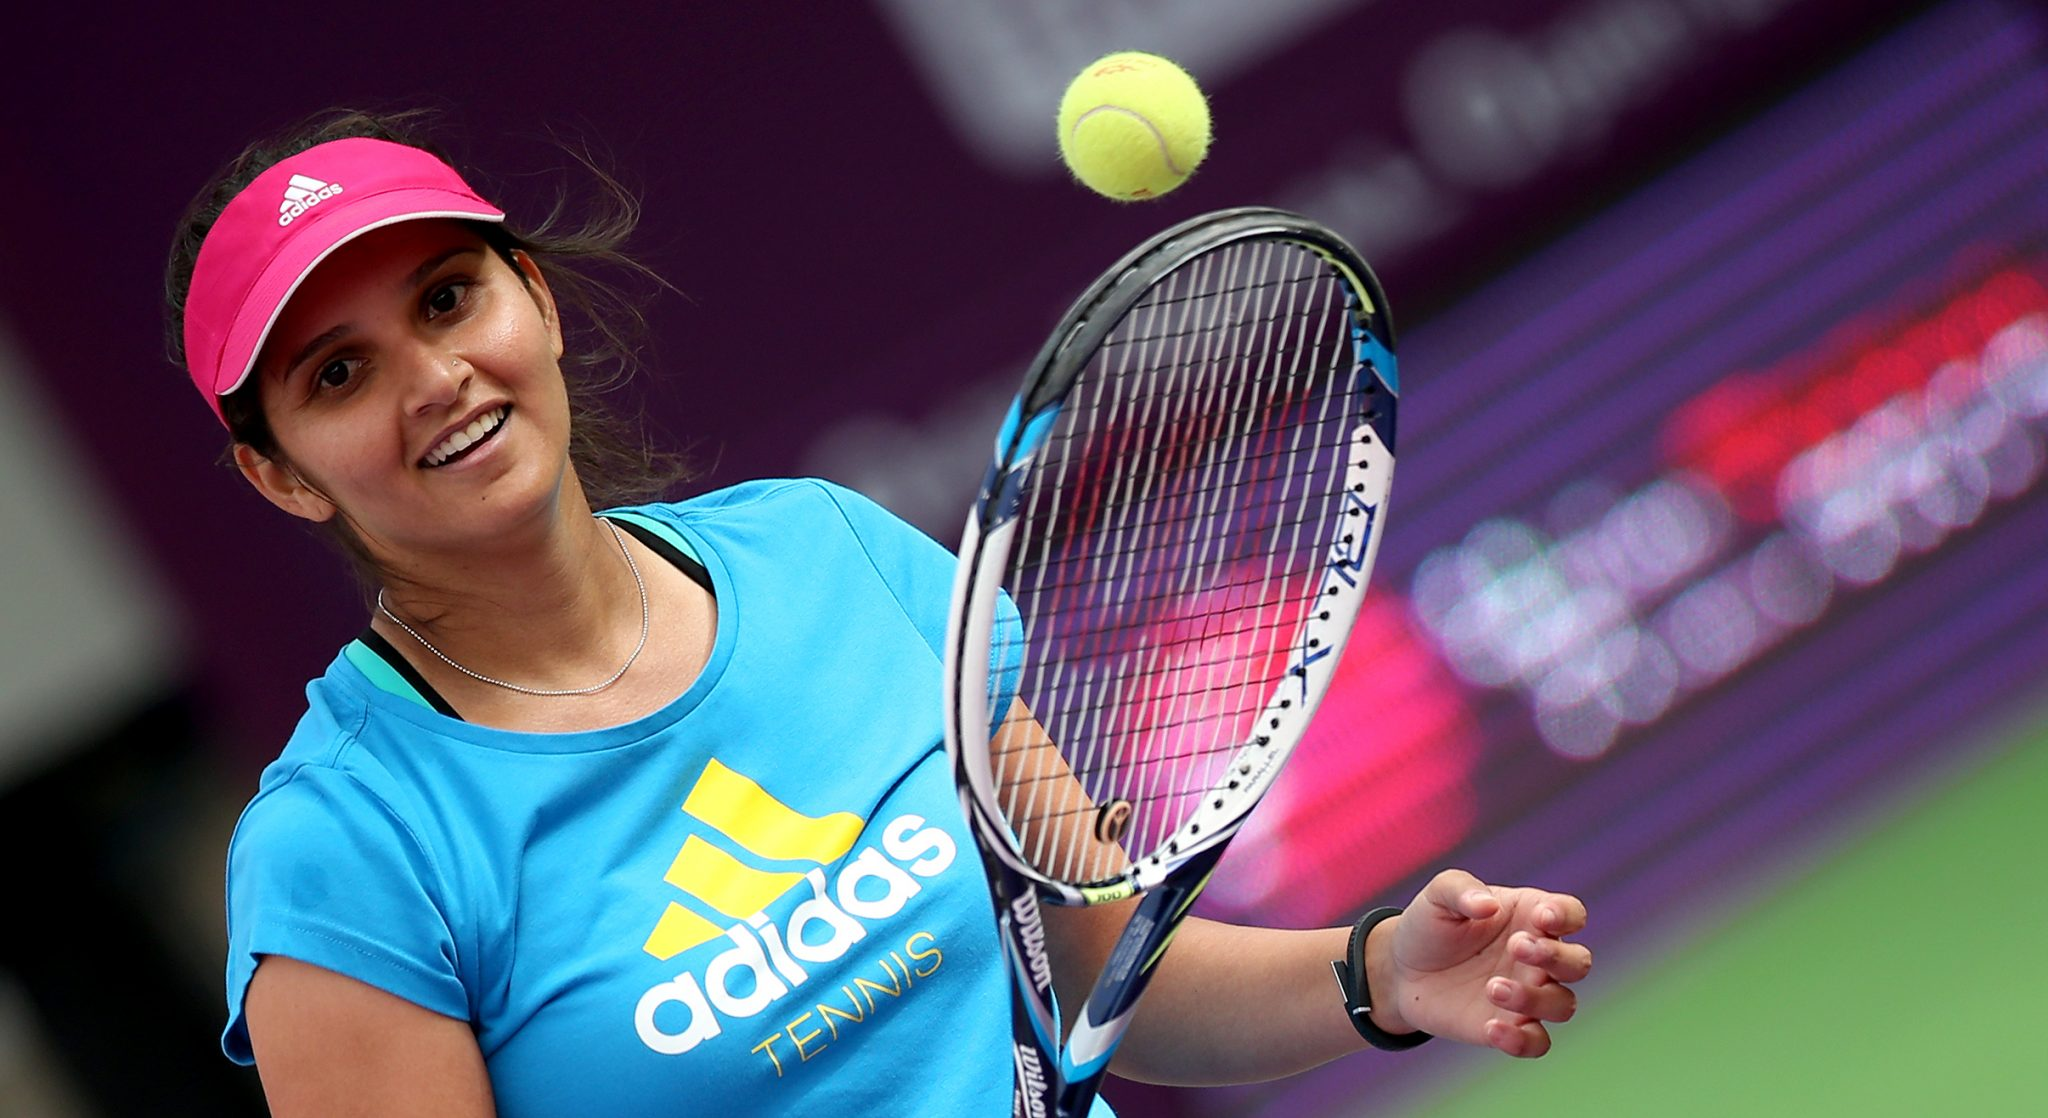 Sania Mirza Olympic games 2016